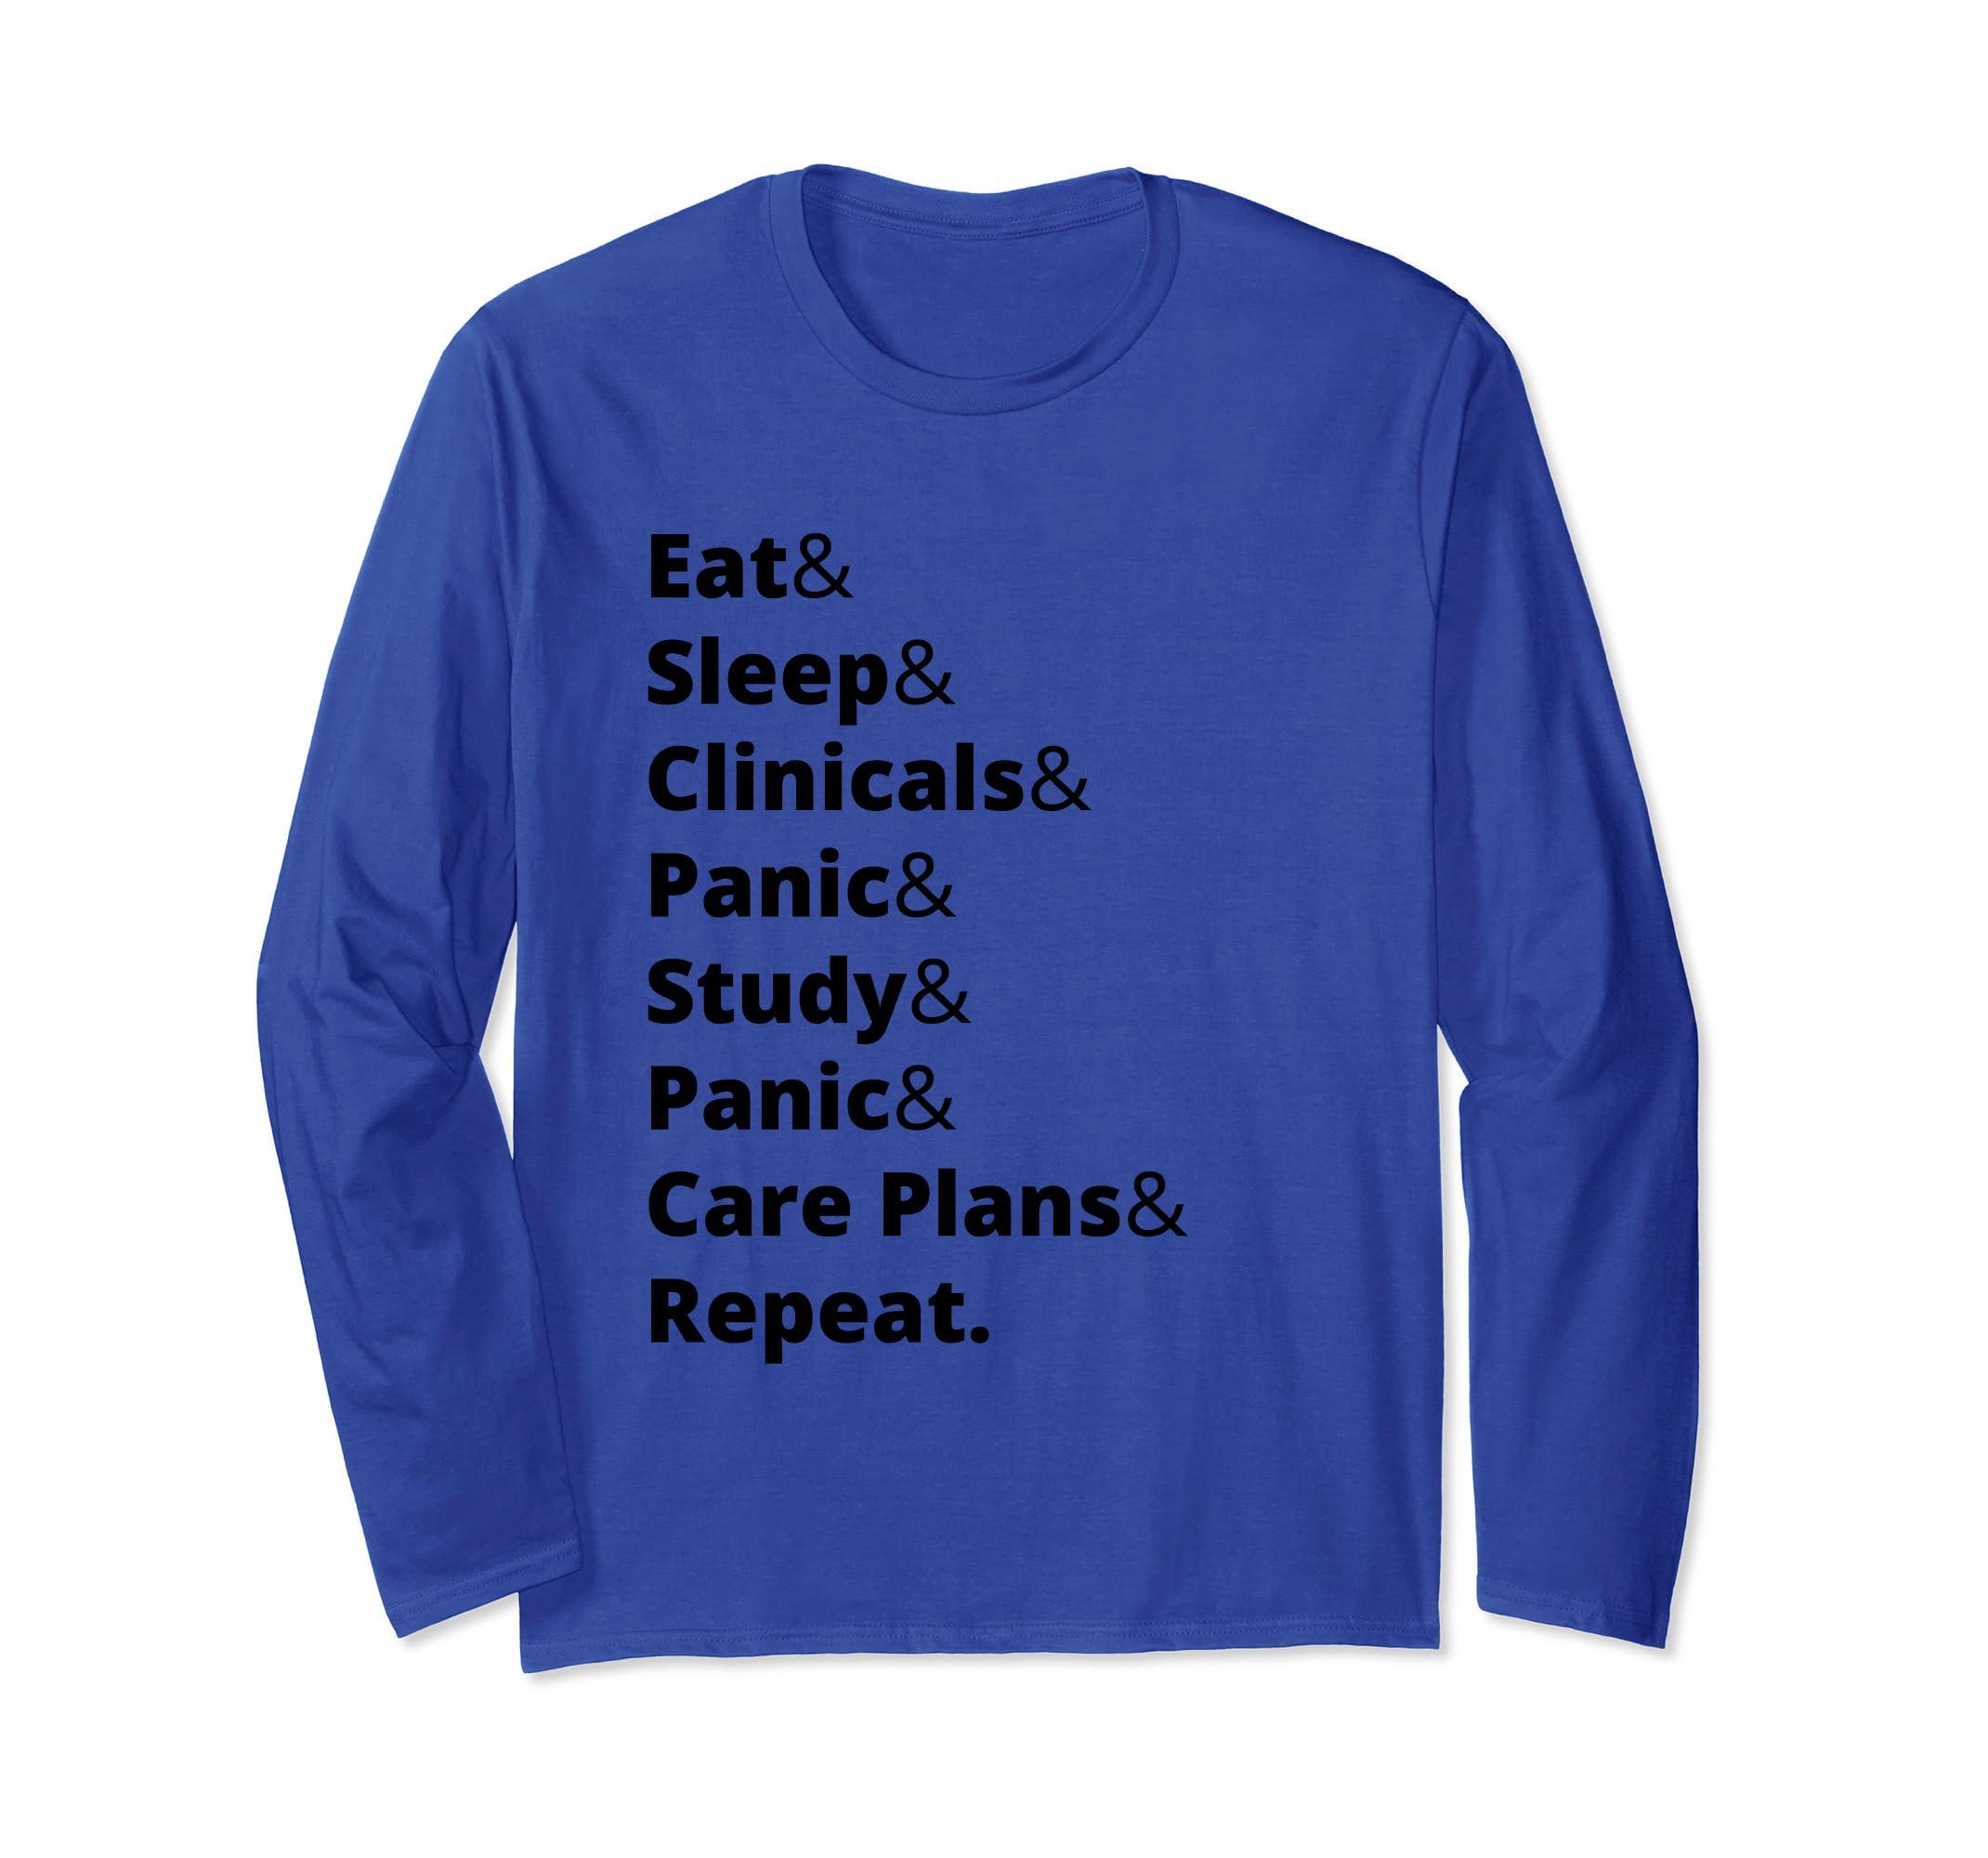 Eat & Sleep & Clinicals Long Sleeve-Bawle